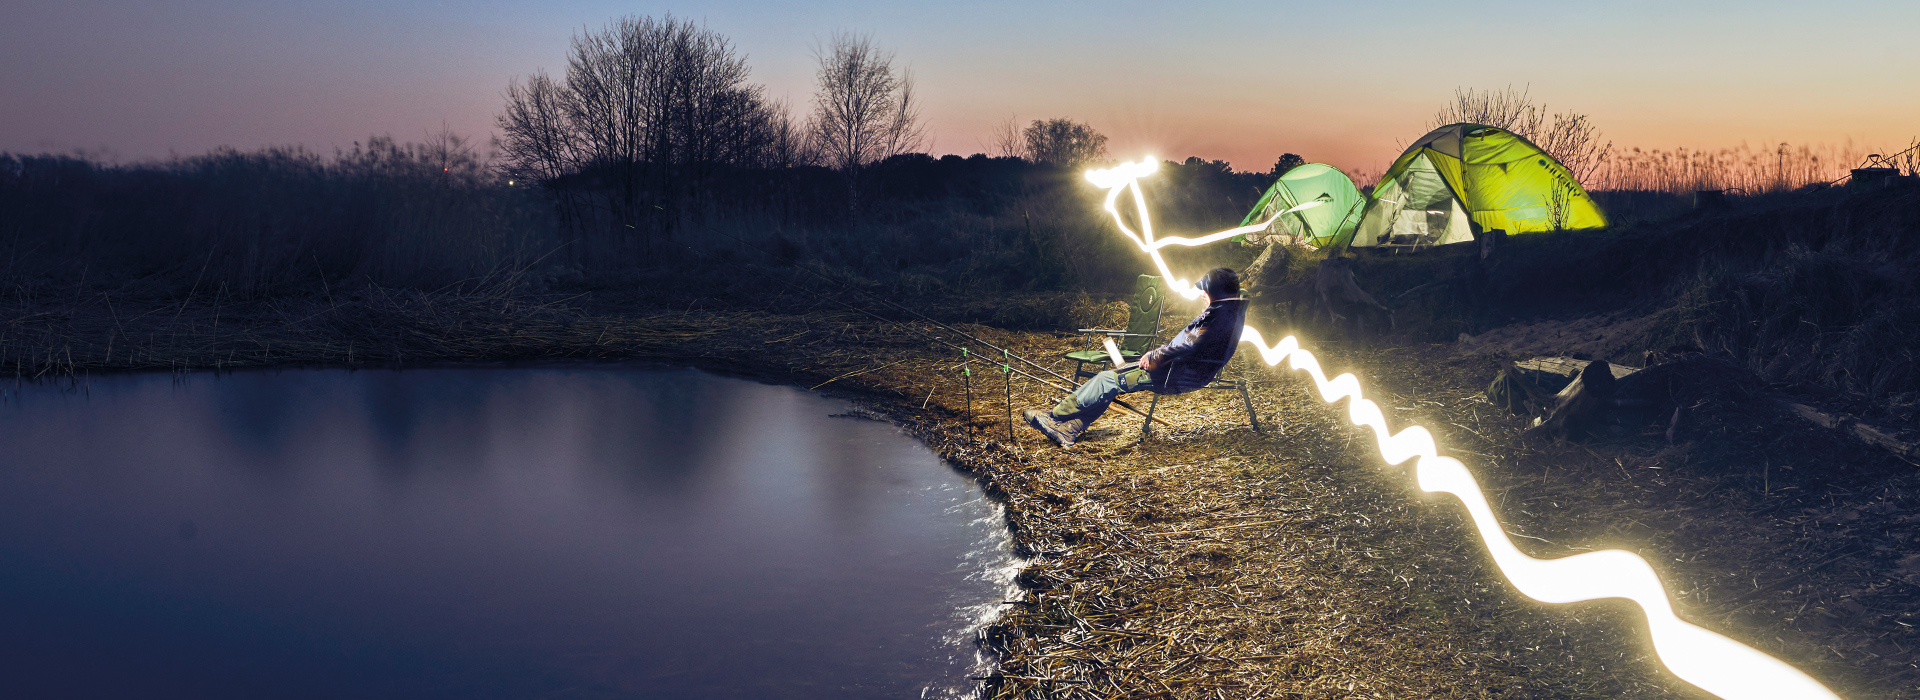 Lanterna Deeper PowerIlluminazione all'aria aperta